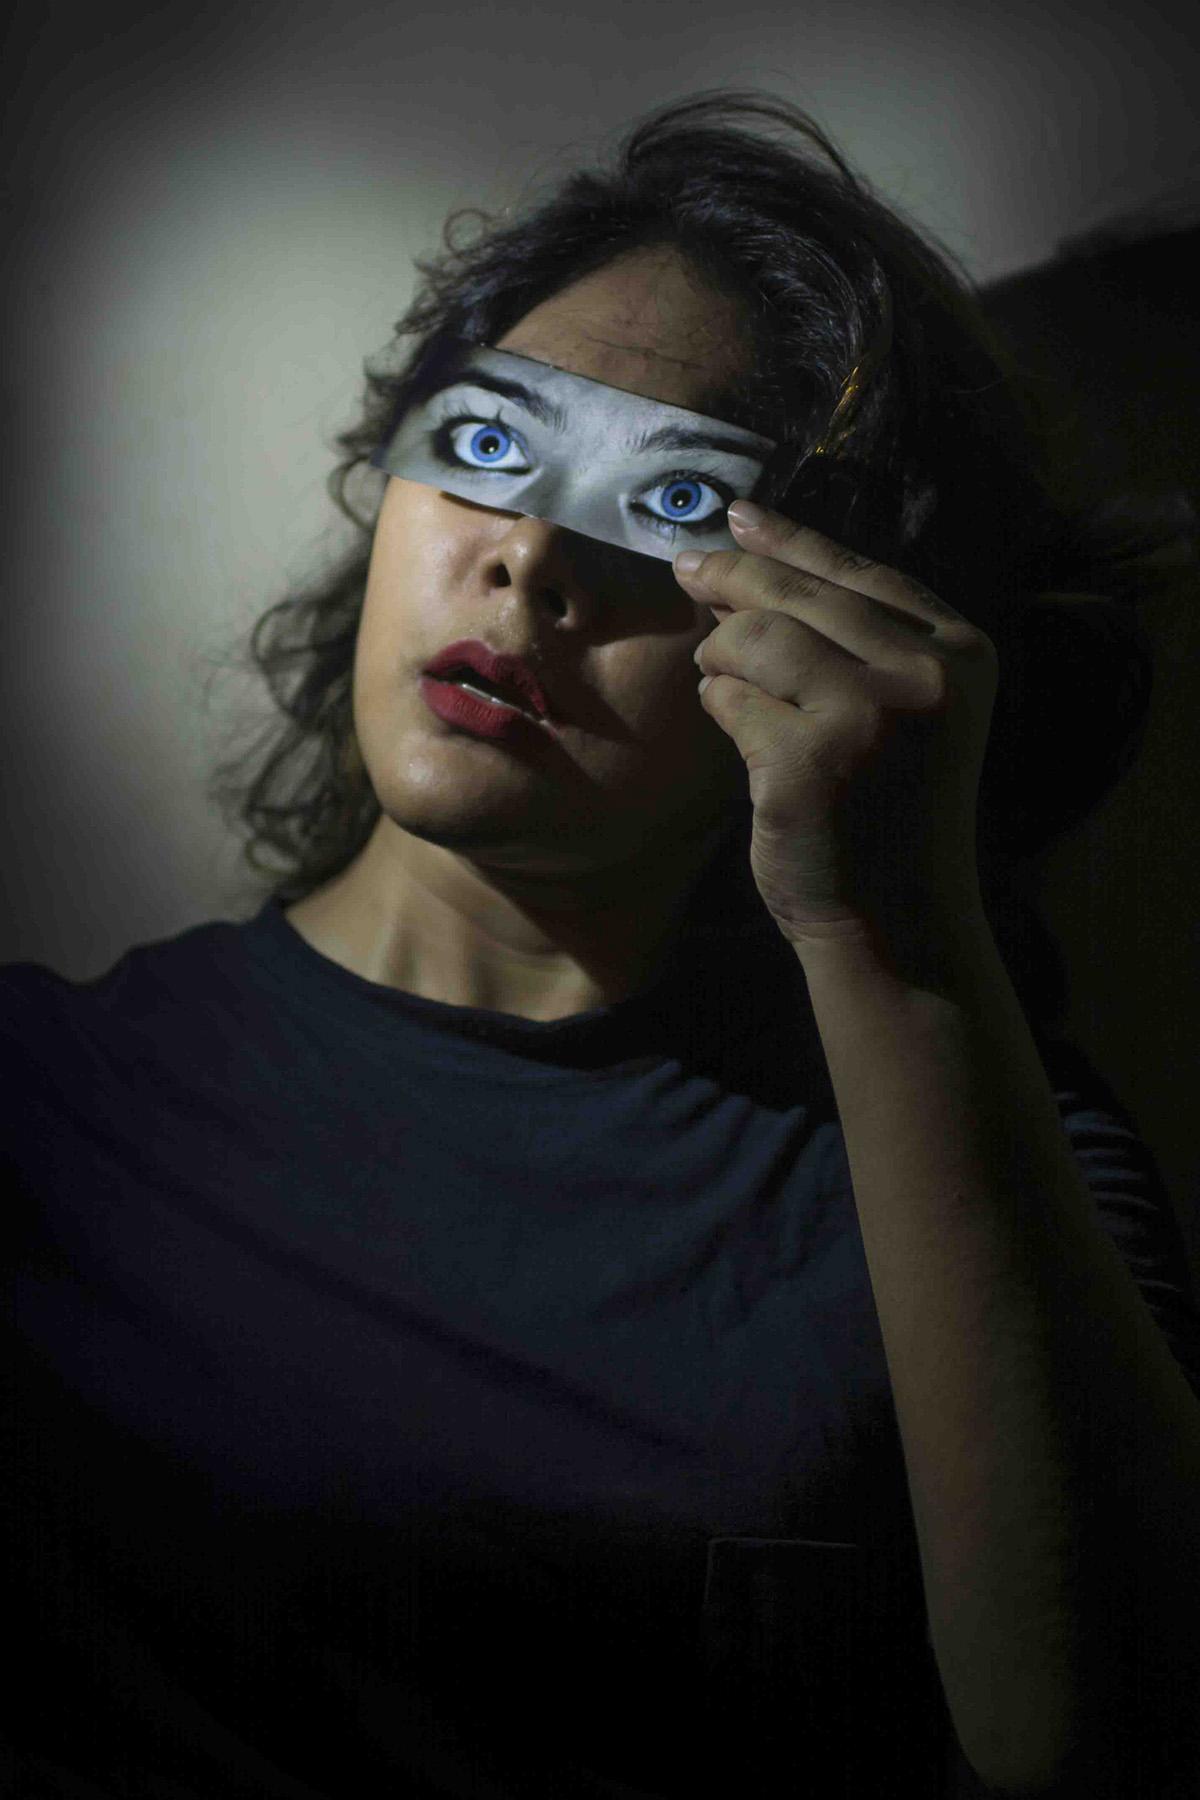 Joya_Korem_Woman_I have to look through imprinted eyes_4.jpg